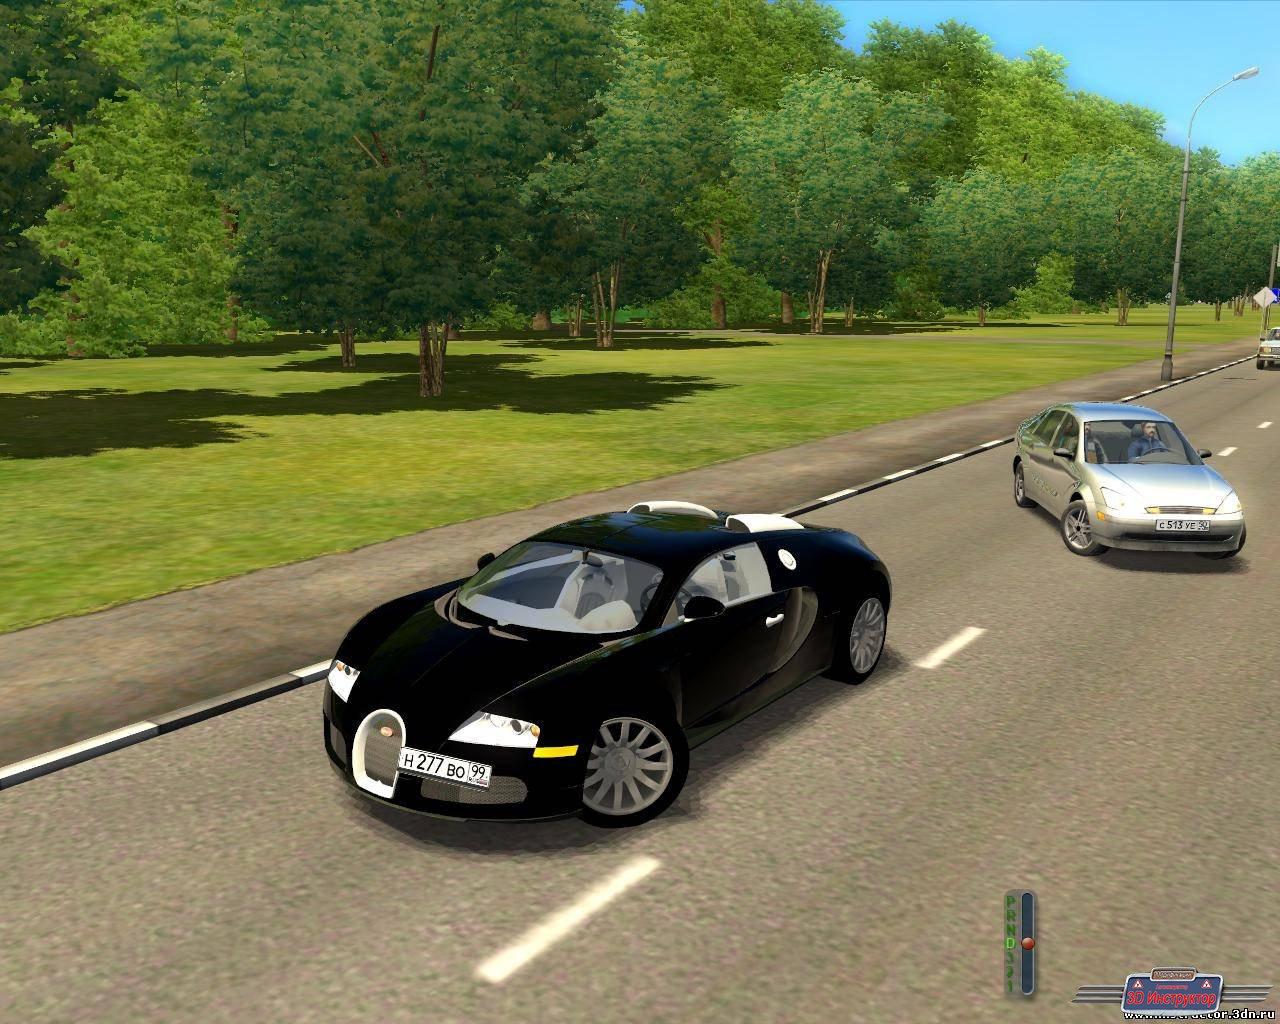 Bugatti Veyron для 3D Инструктор [2.2.7]